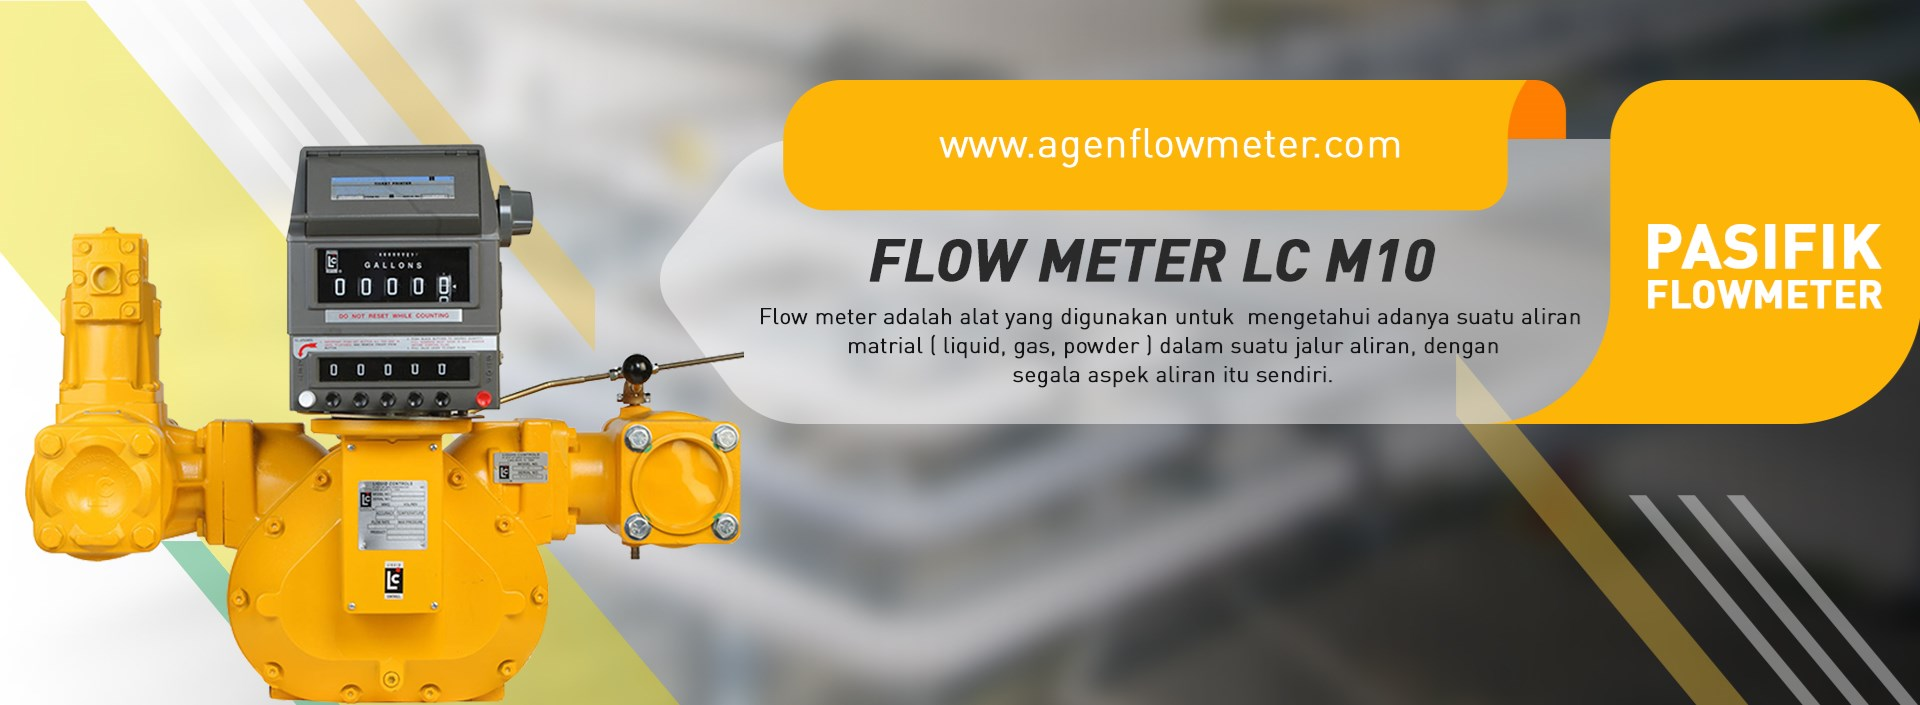 Pasifik Flowmeter